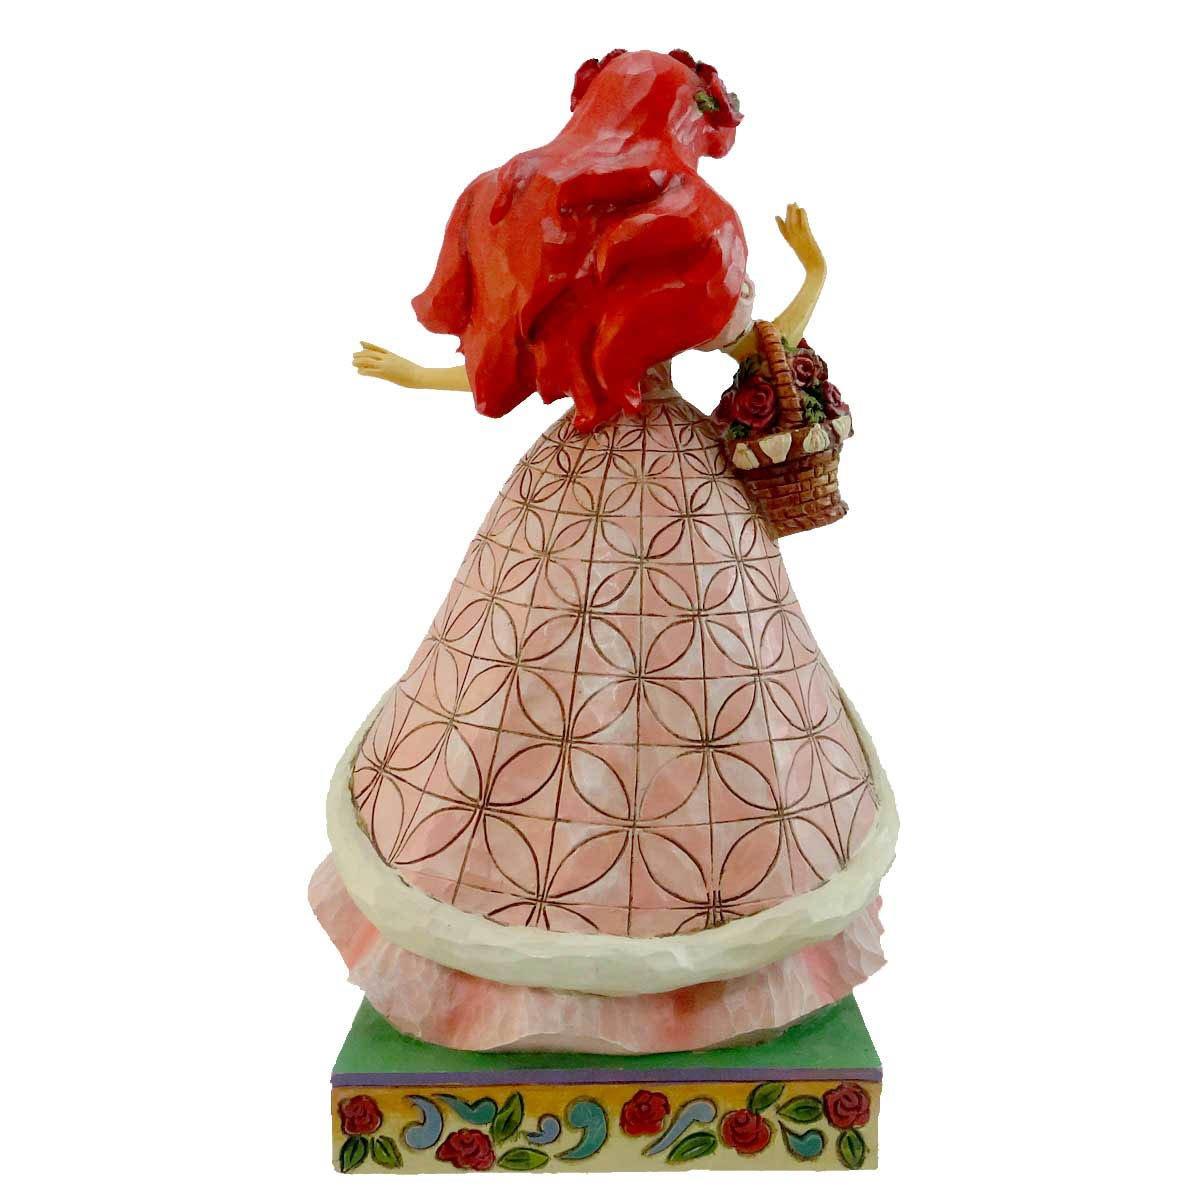 Disney Traditions by Jim Shore Ariel Summer Figurine, 7-1/4-Inch